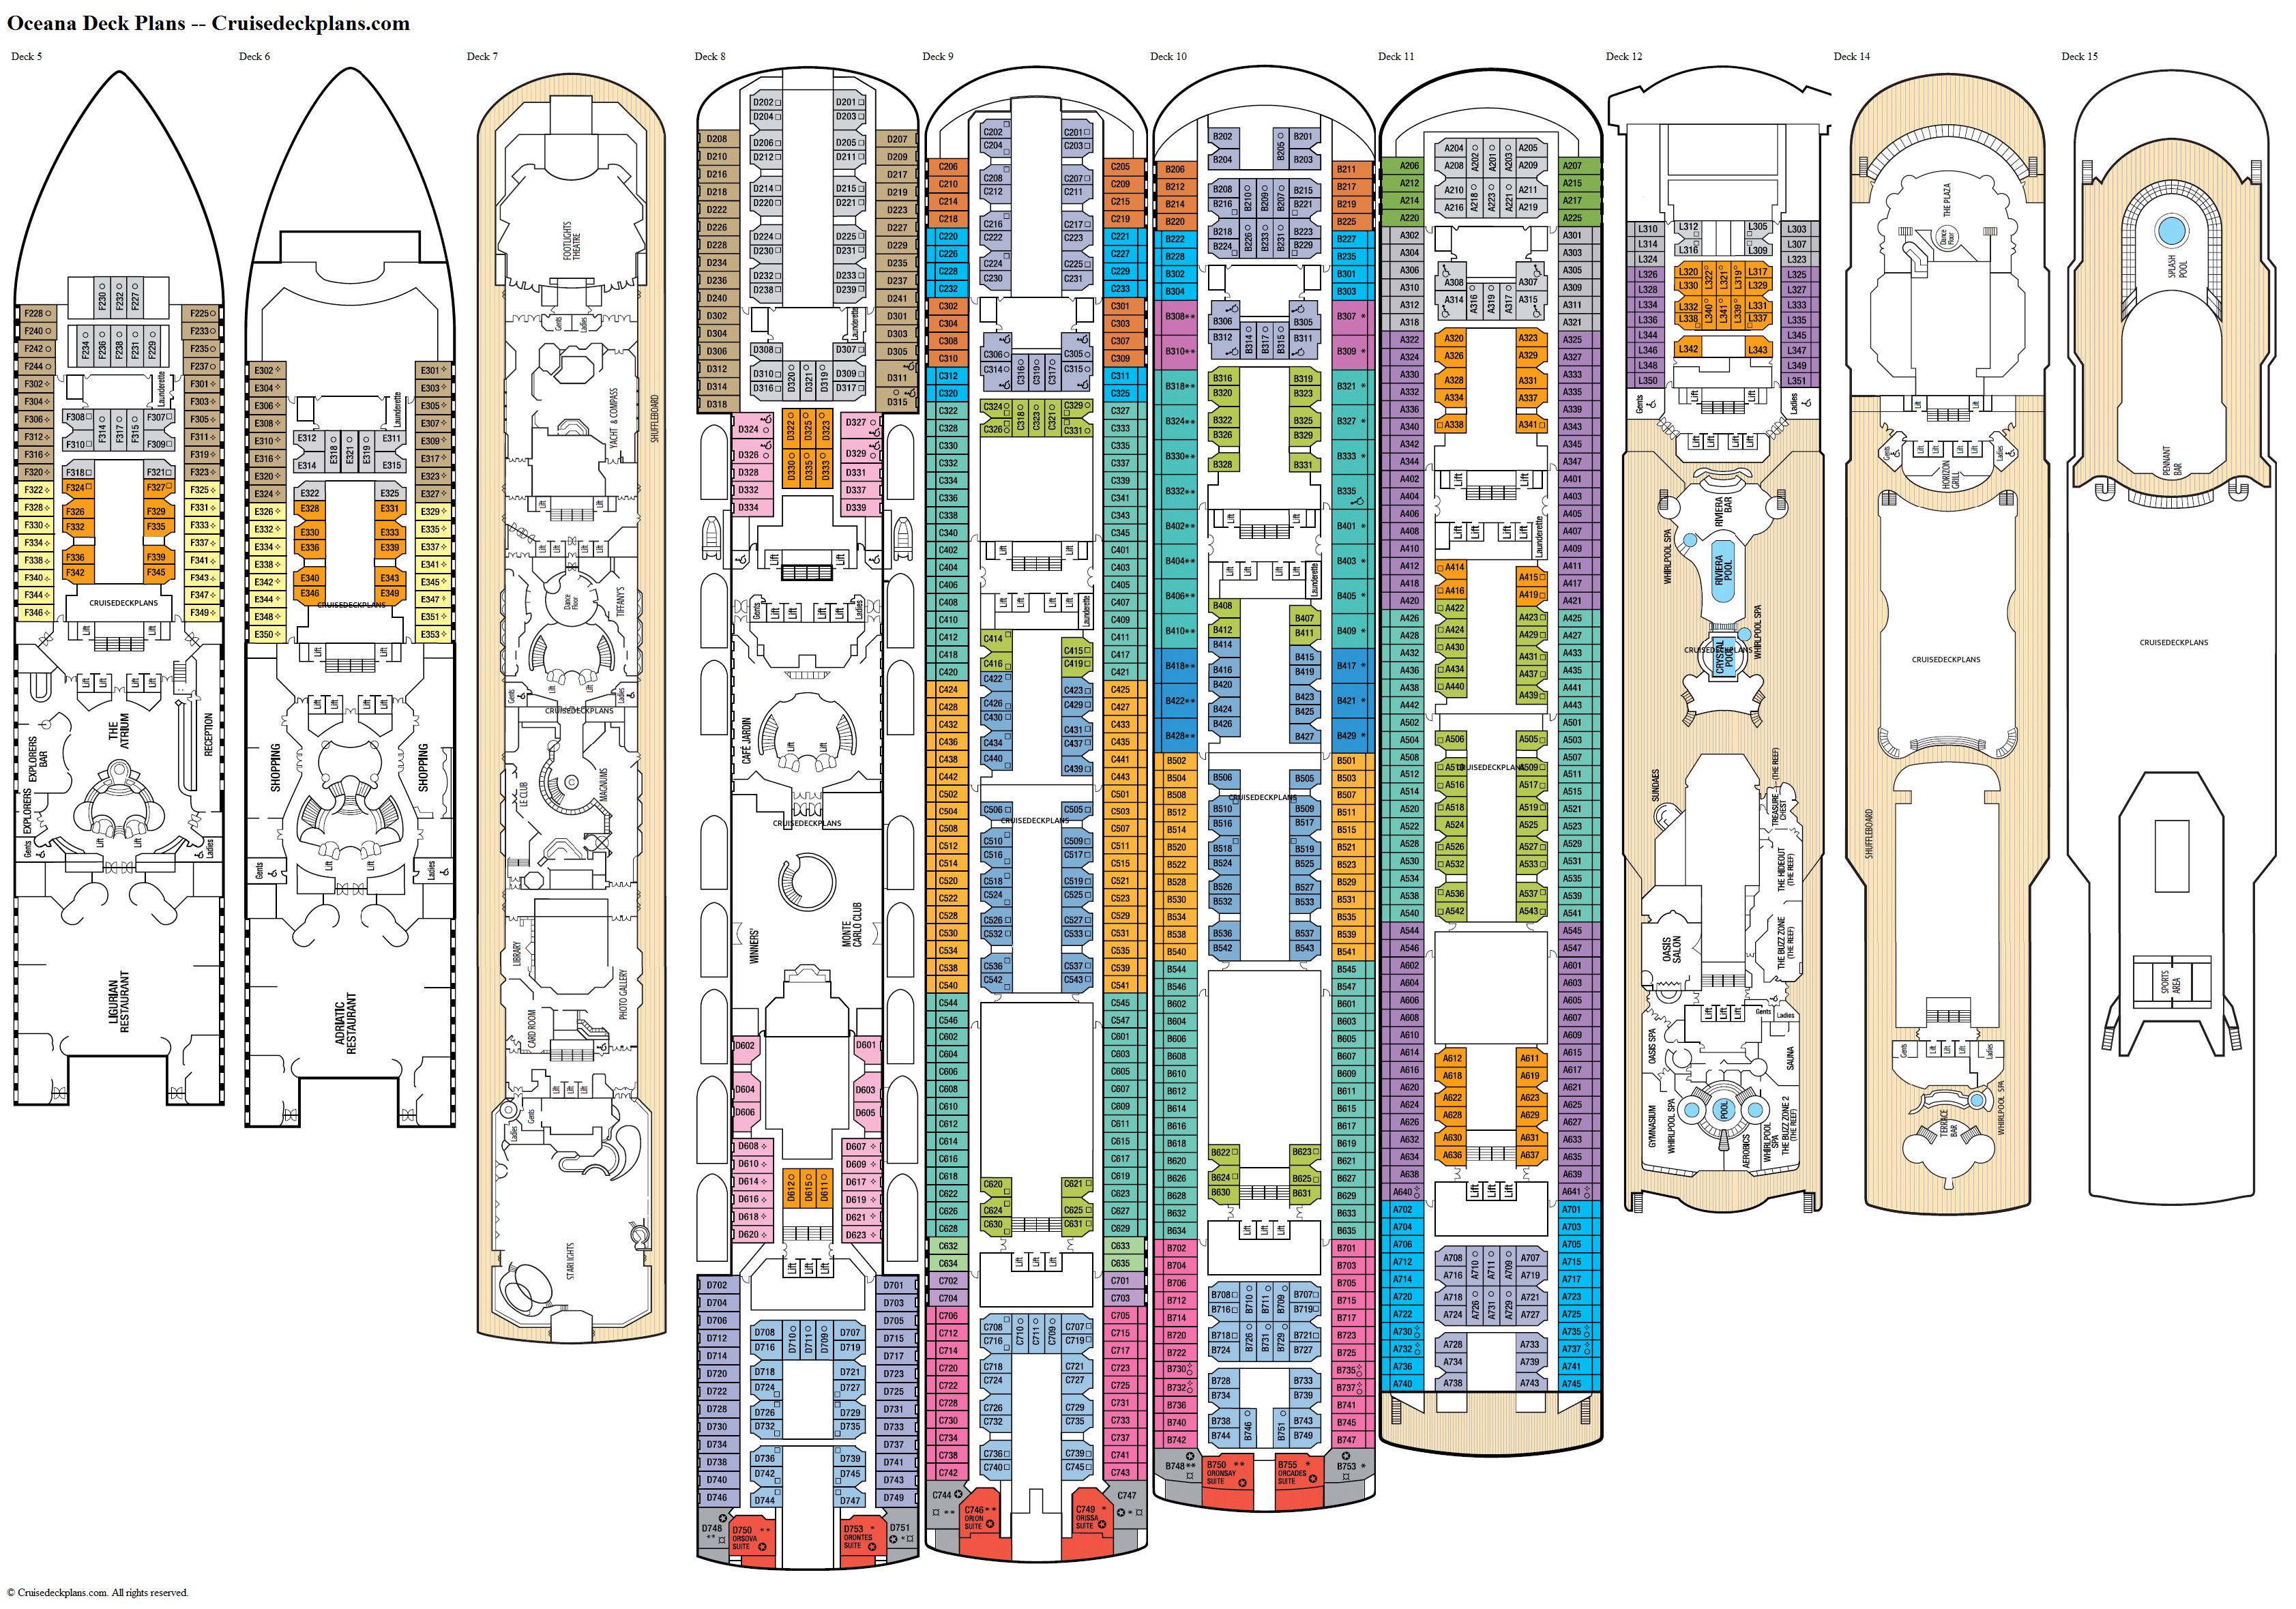 Oceana deck 11 deck plan tour for Deck blueprints online